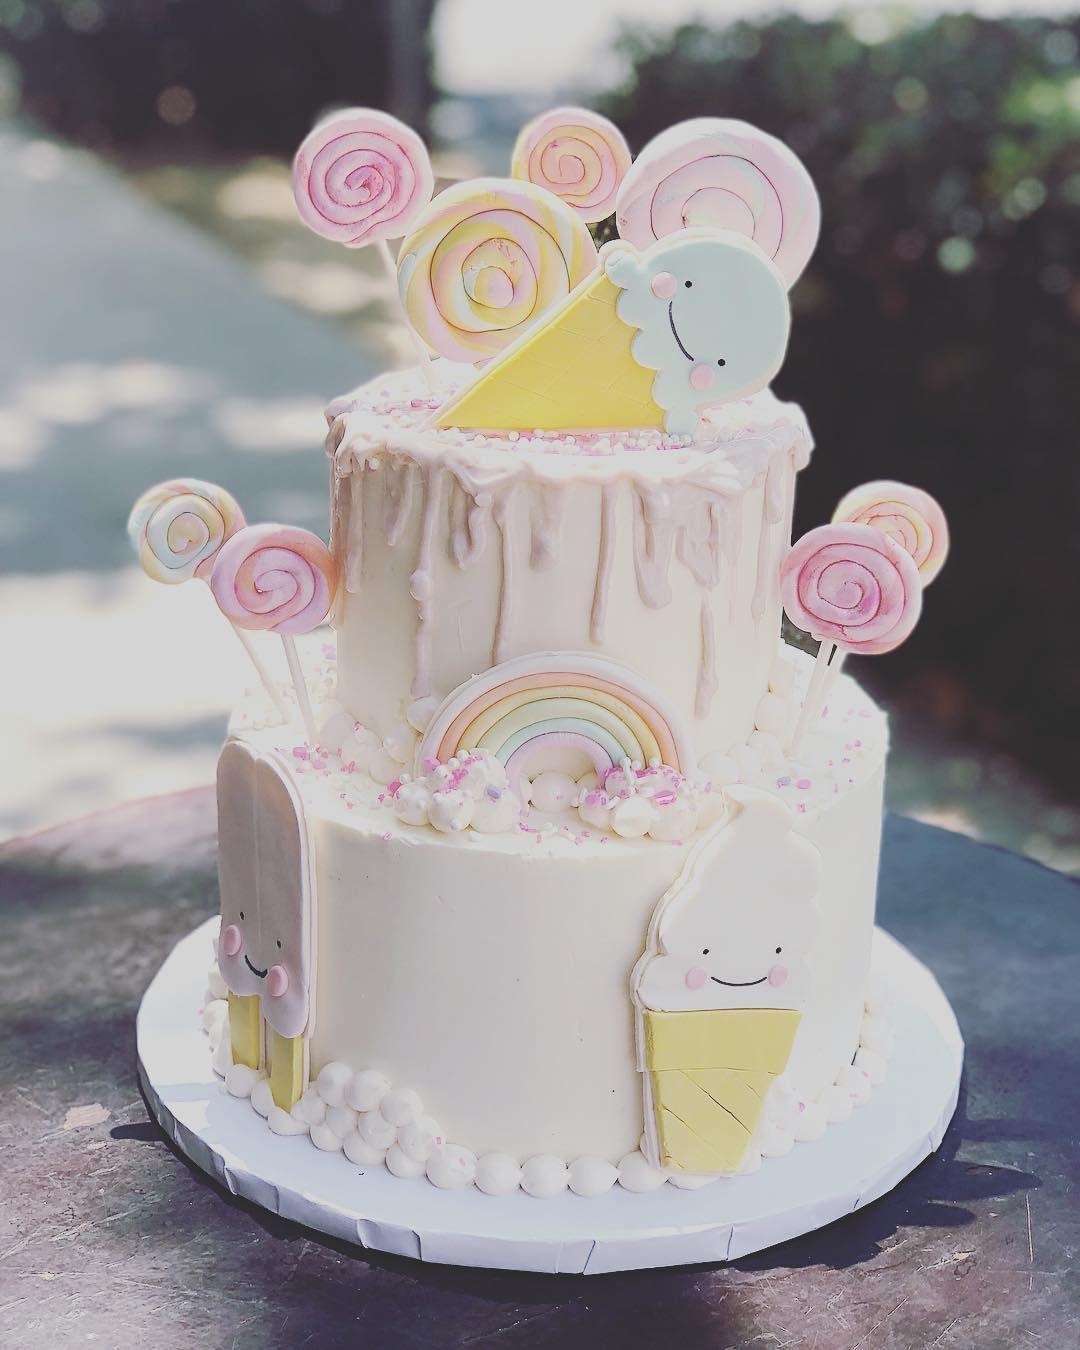 Perfect Cake For Summer Hannahcoffee Hannahbakedthis Hannahcoffeeteasweets Icecream Icecreamcake Baking Baker Cakes Kitchenlife